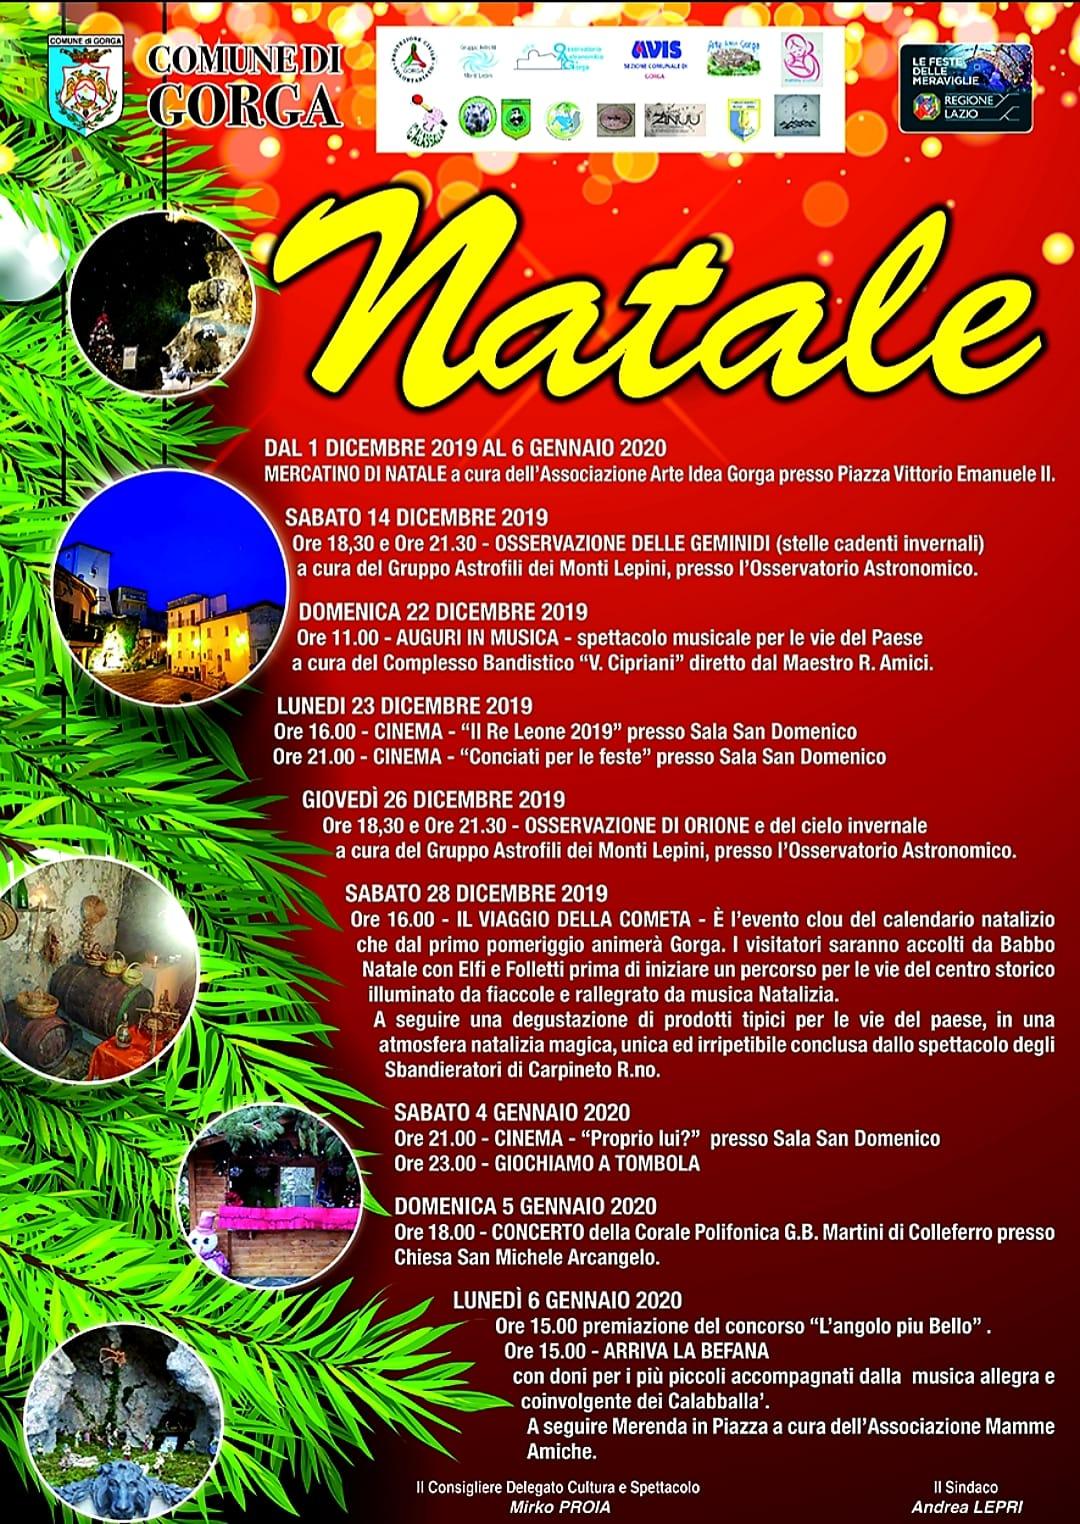 natale-gorga